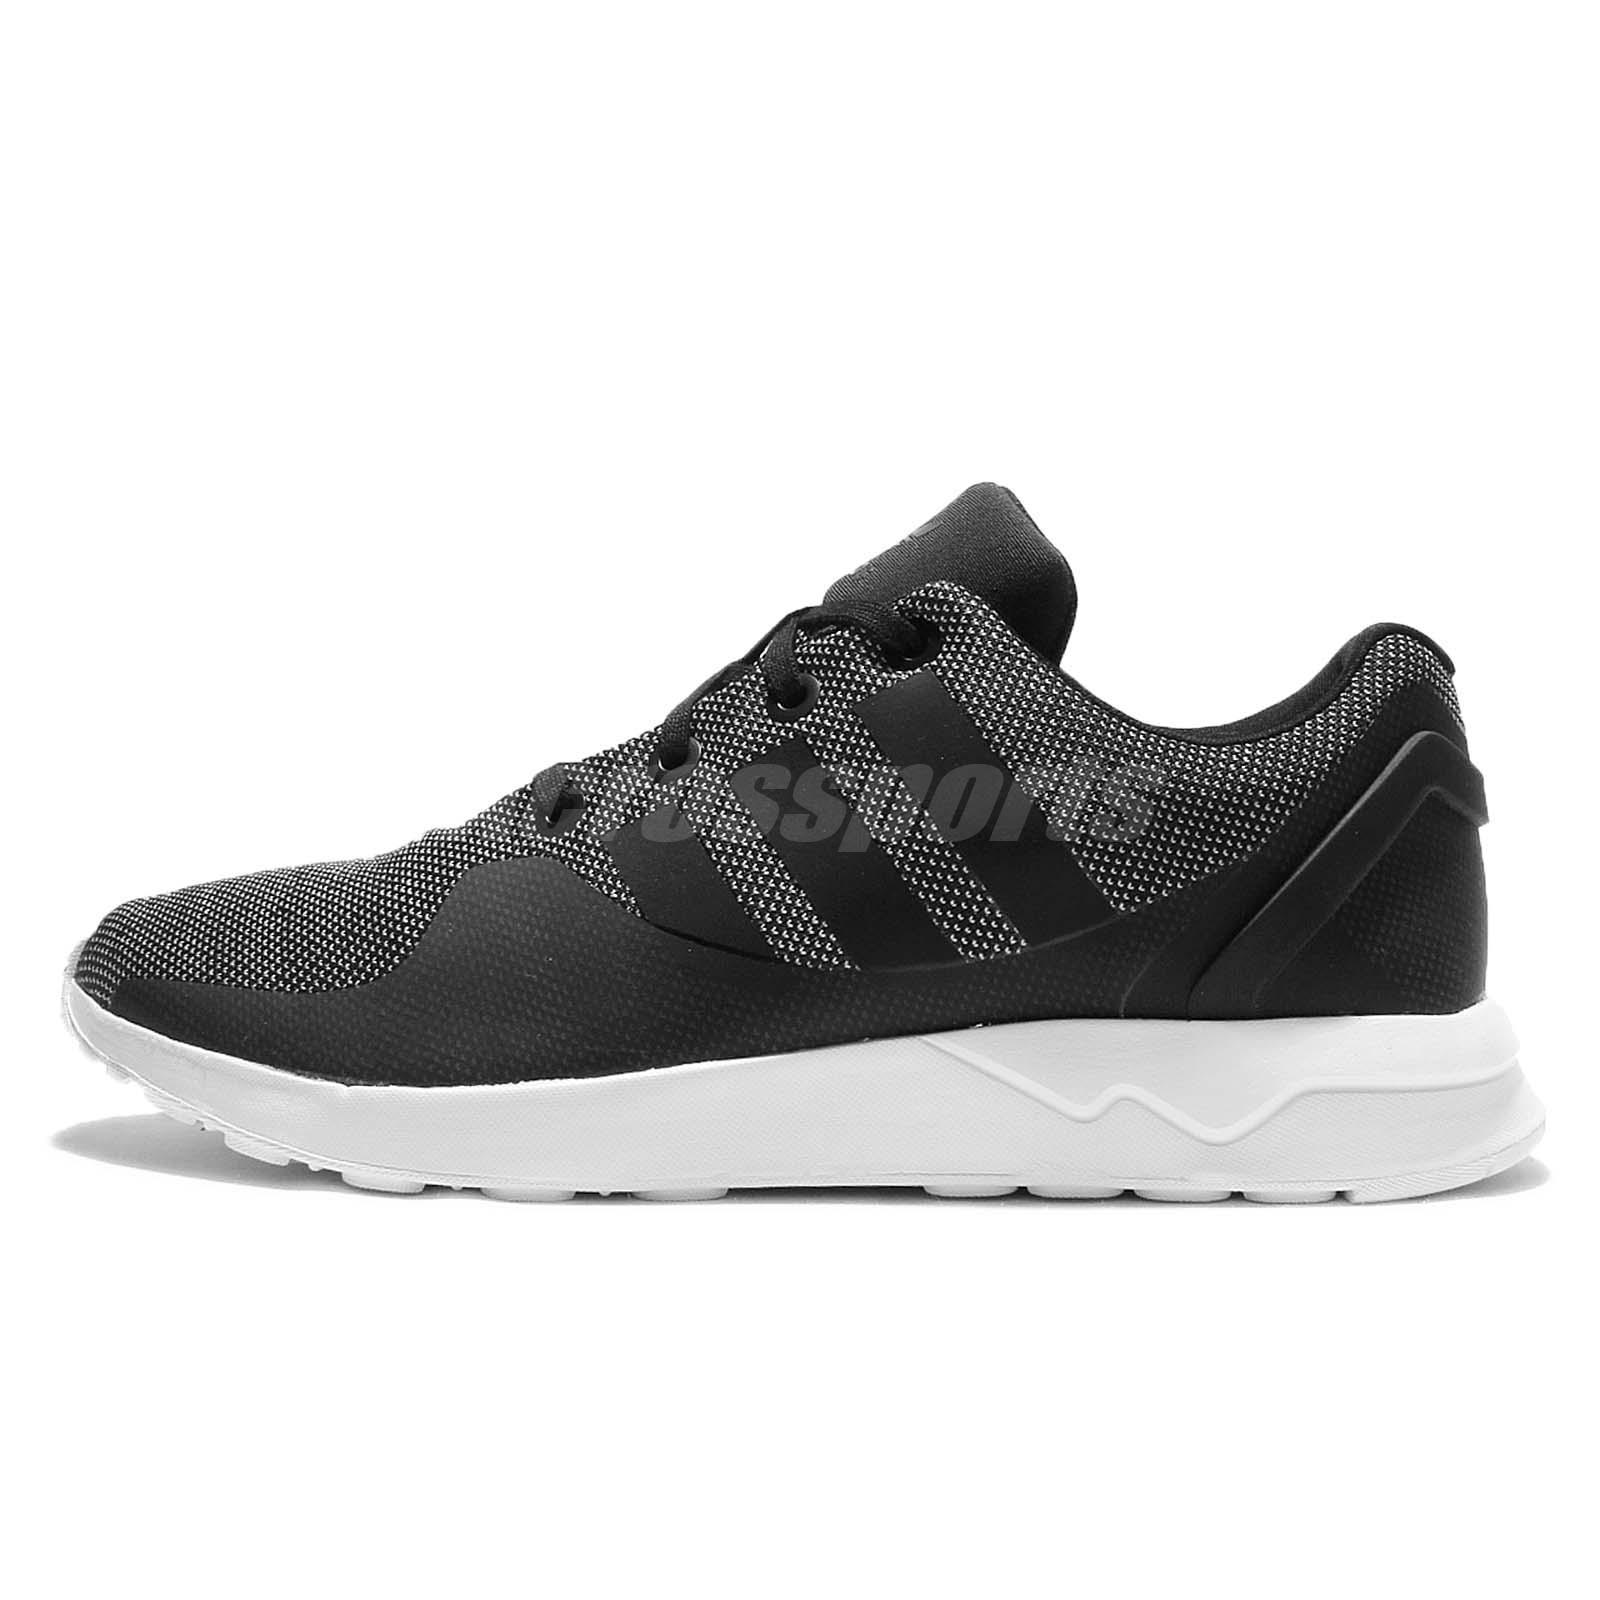 check out c7a88 8c7b8 ... spain adidas originals zx flux adv tech textile black grey mens running  shoes s76396 fbb8d ff688